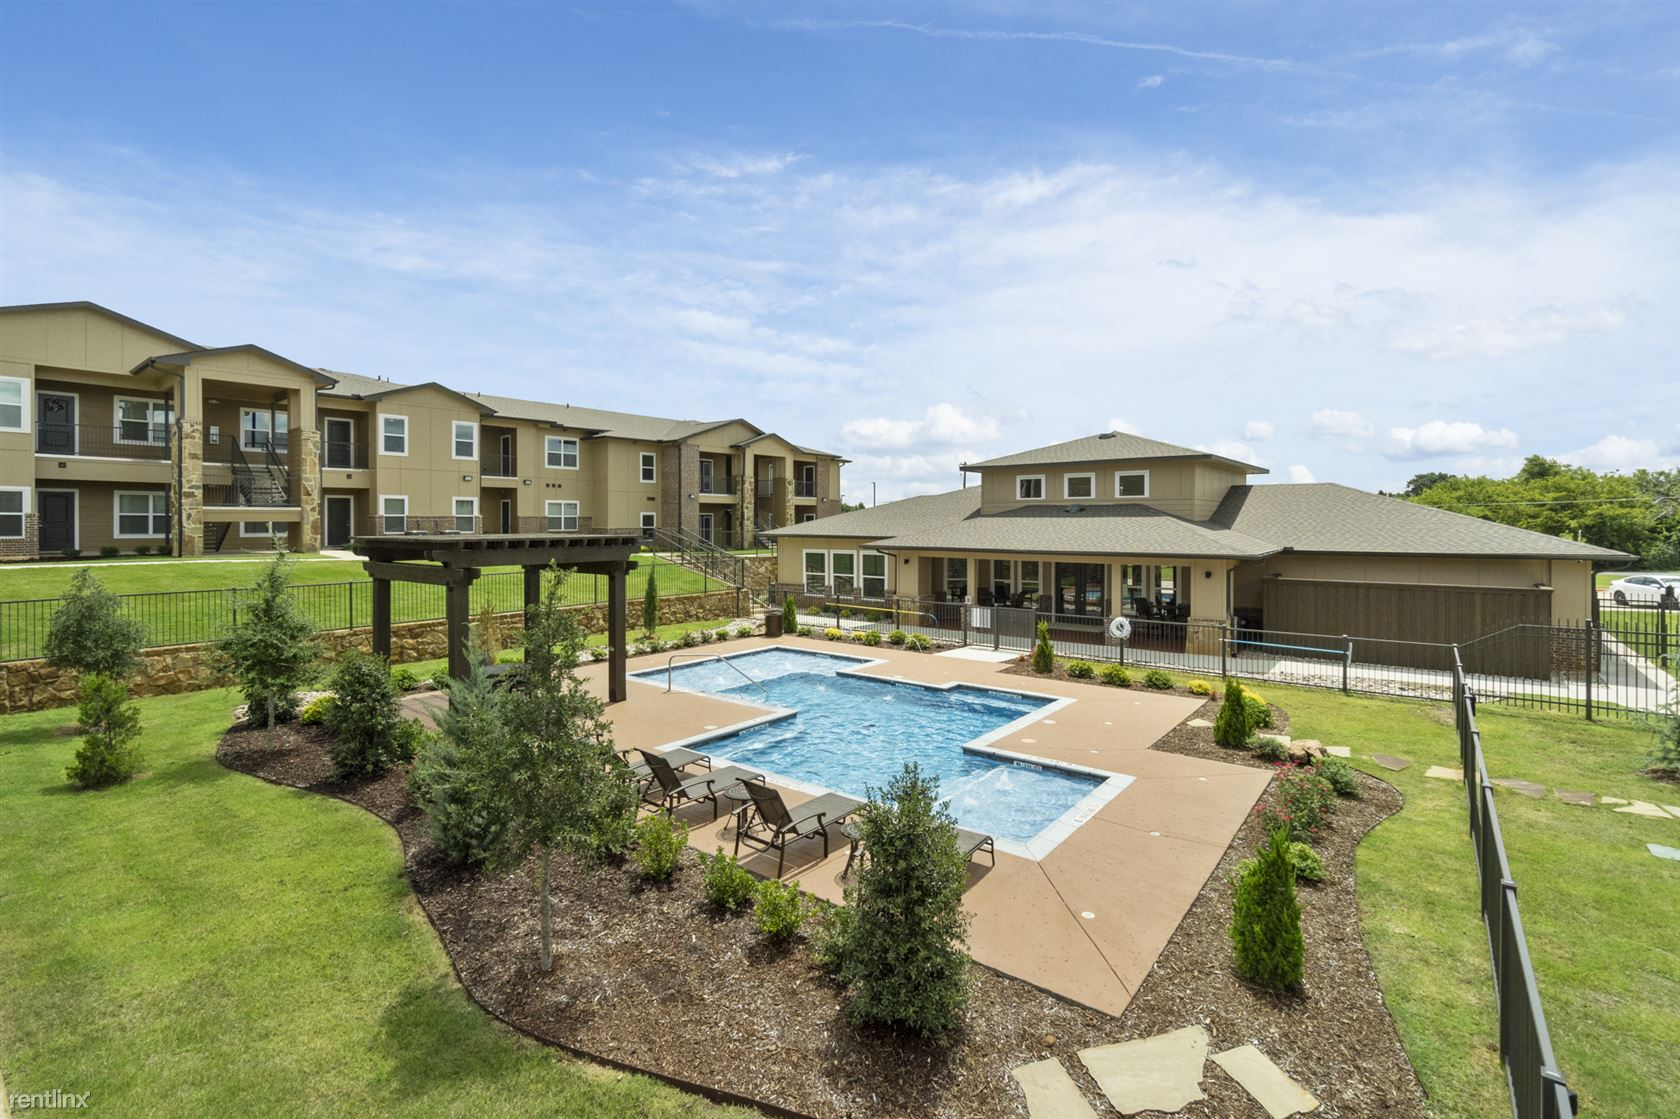 2901 Loy Lake Rd, Denison, TX - 855 USD/ month